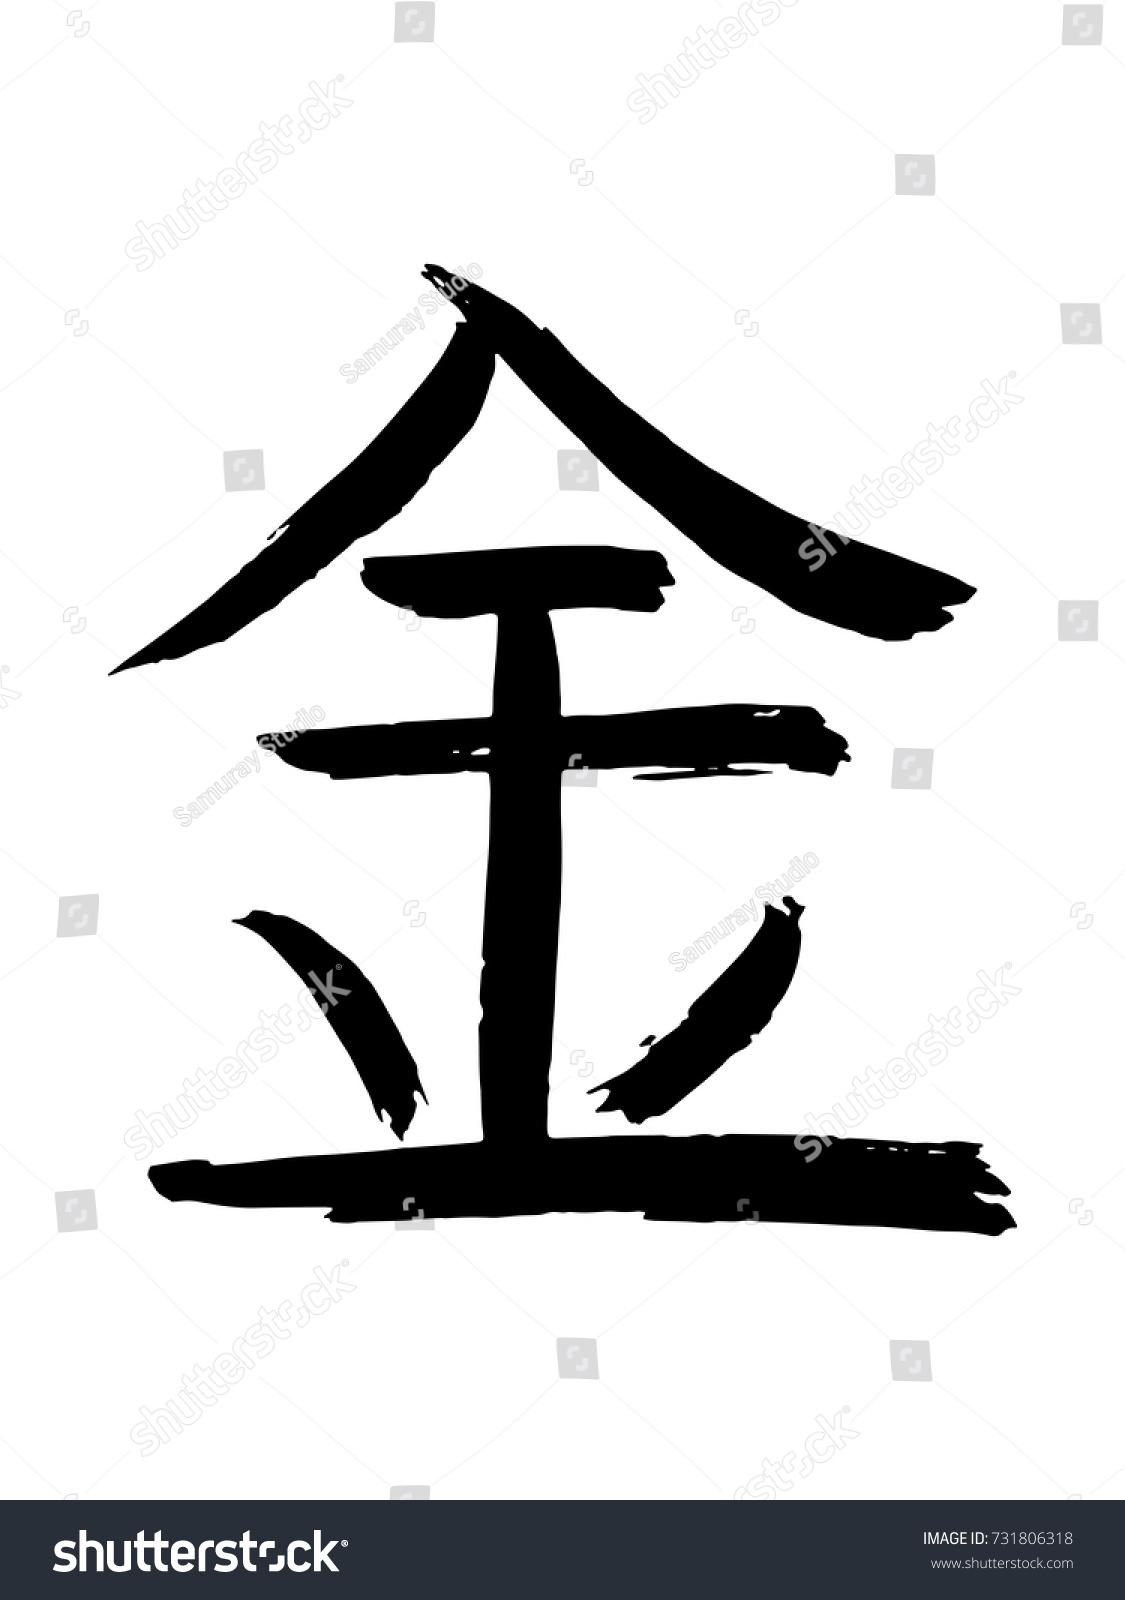 Hieroglyph chinese translate friday vector japanese stock vector hieroglyph chinese translate friday vector japanese symbols on white background hand drawn calligraphic biocorpaavc